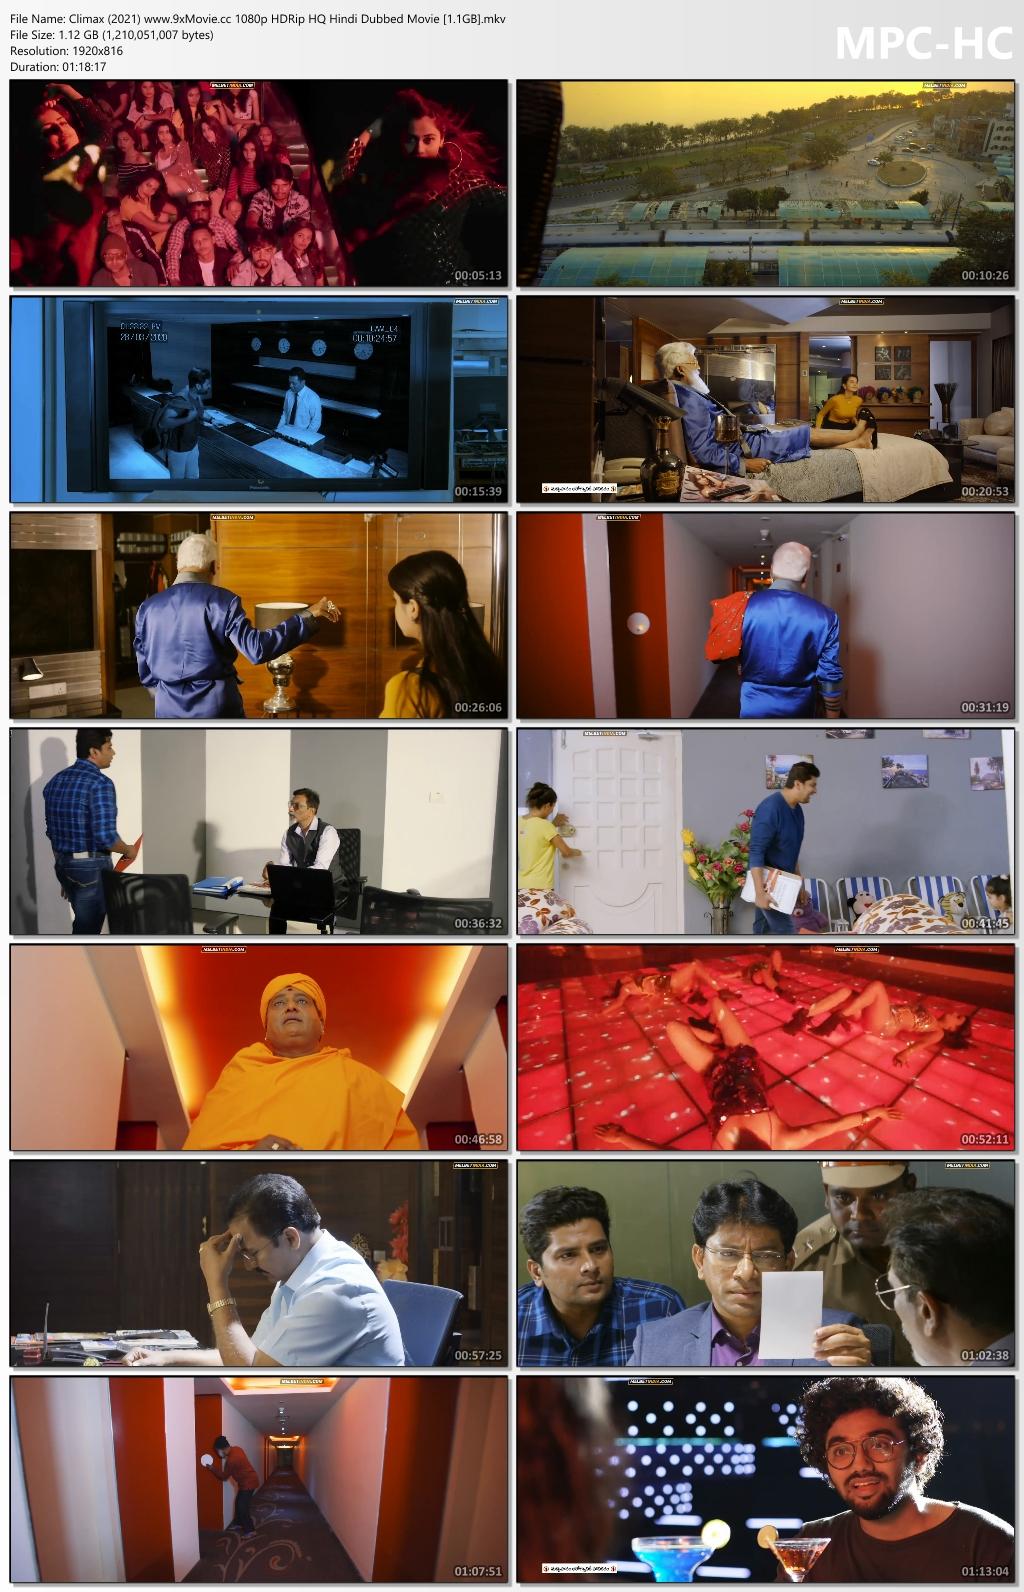 Climax-2021-www-9x-Movie-cc-1080p-HDRip-HQ-Hindi-Dubbed-Movie-1-1-GB-mkv